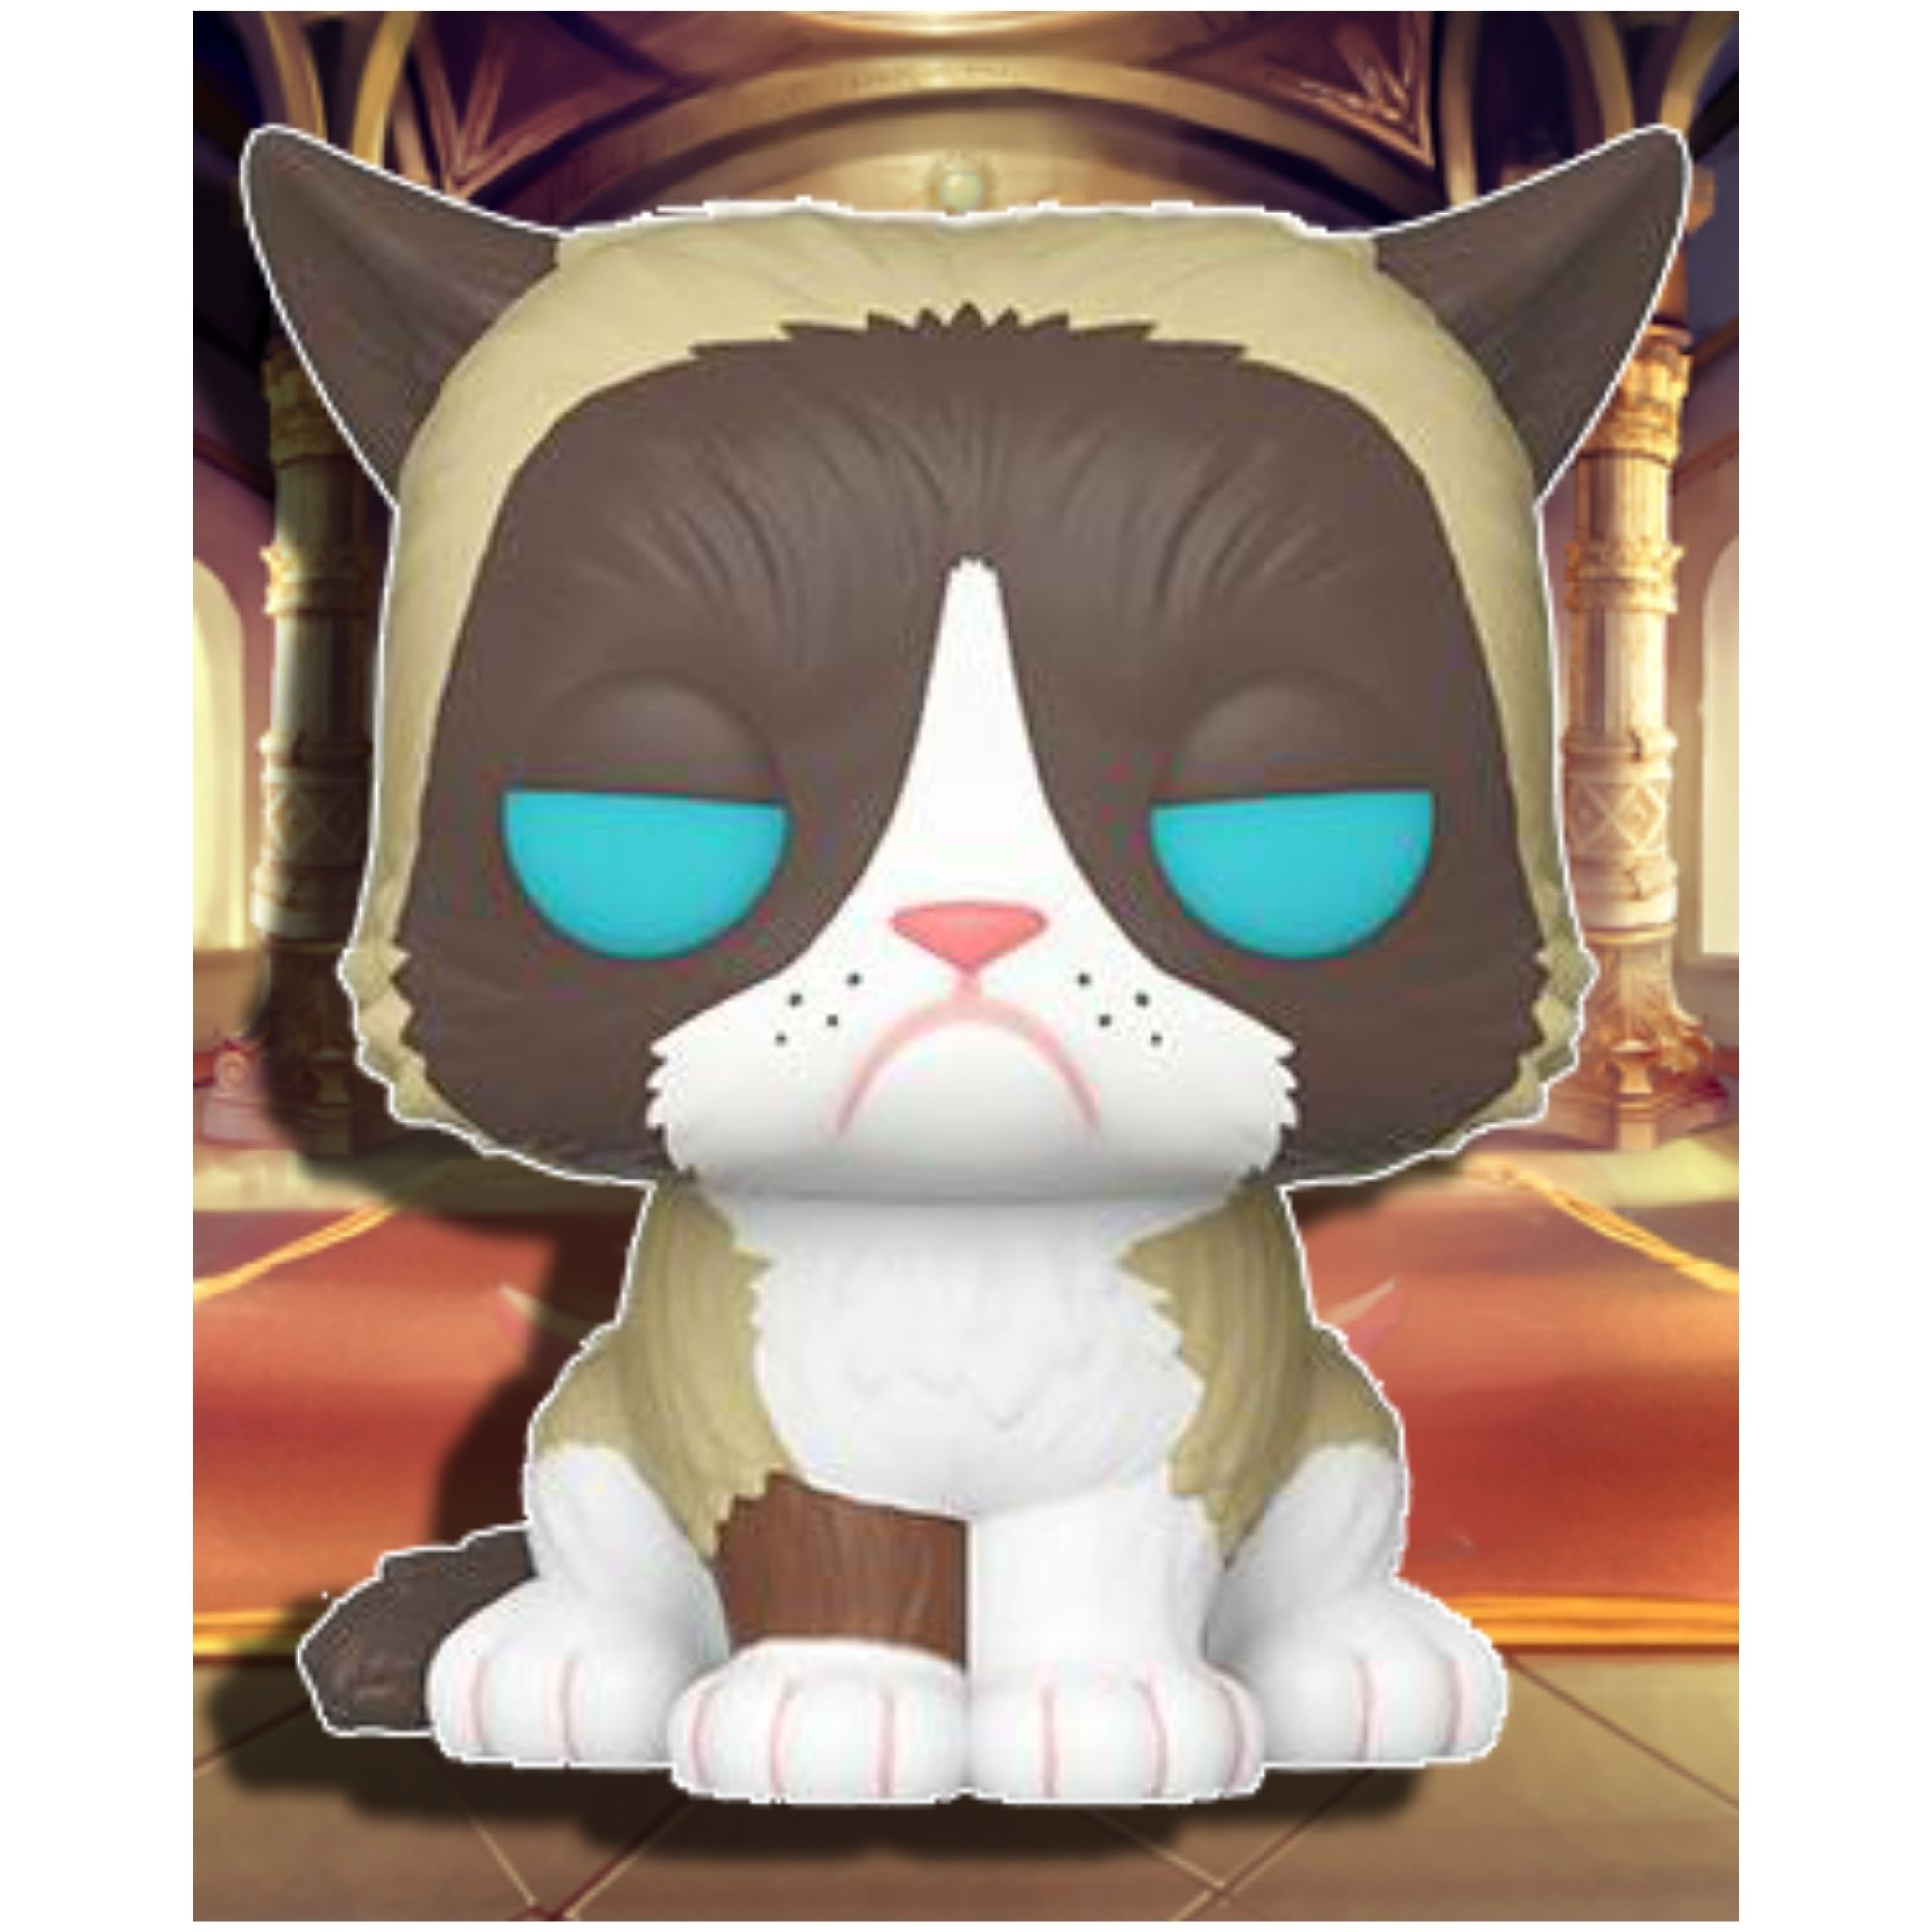 Boneco Funko Pop Icons Grumpy Cat Gata Rabugenta #60  - Game Land Brinquedos